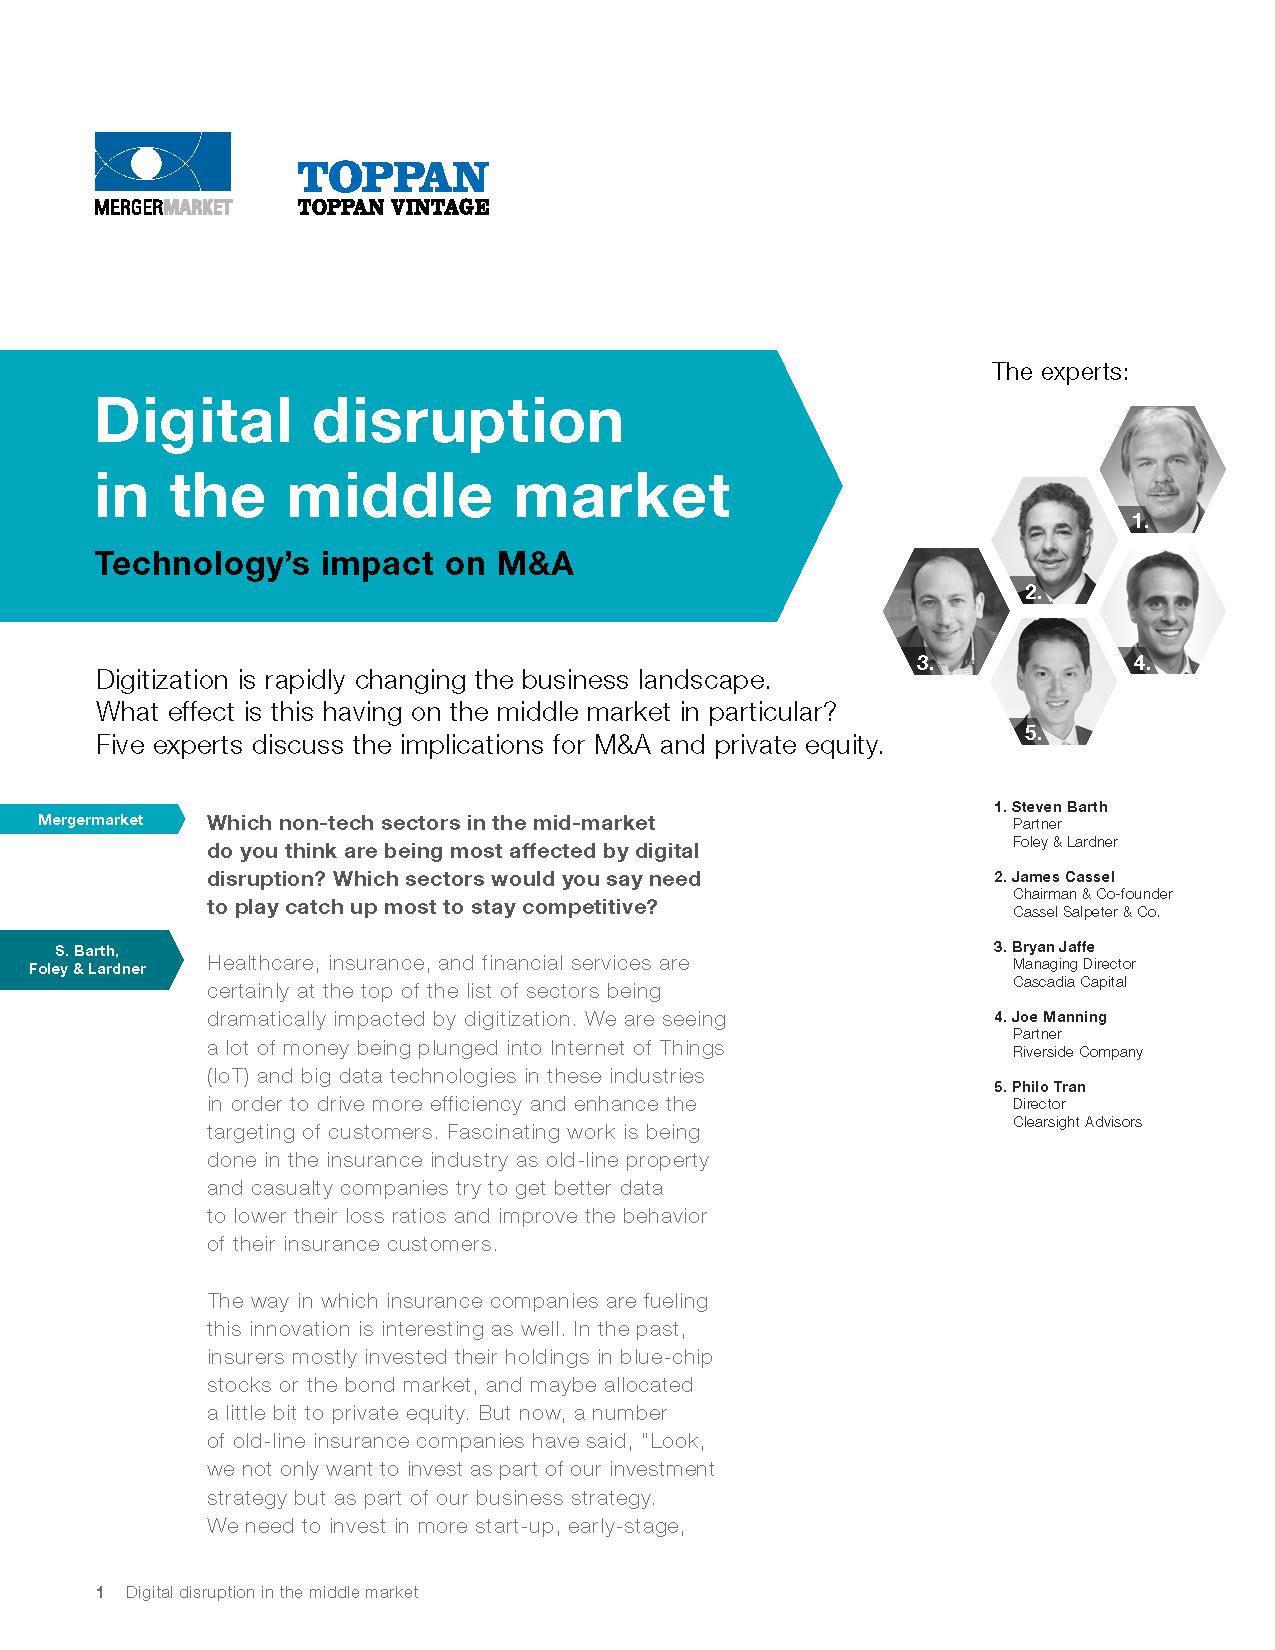 Toppan Vite_Q2 2017 newsletter_Digital Disruption_Final LR_Page_01.png